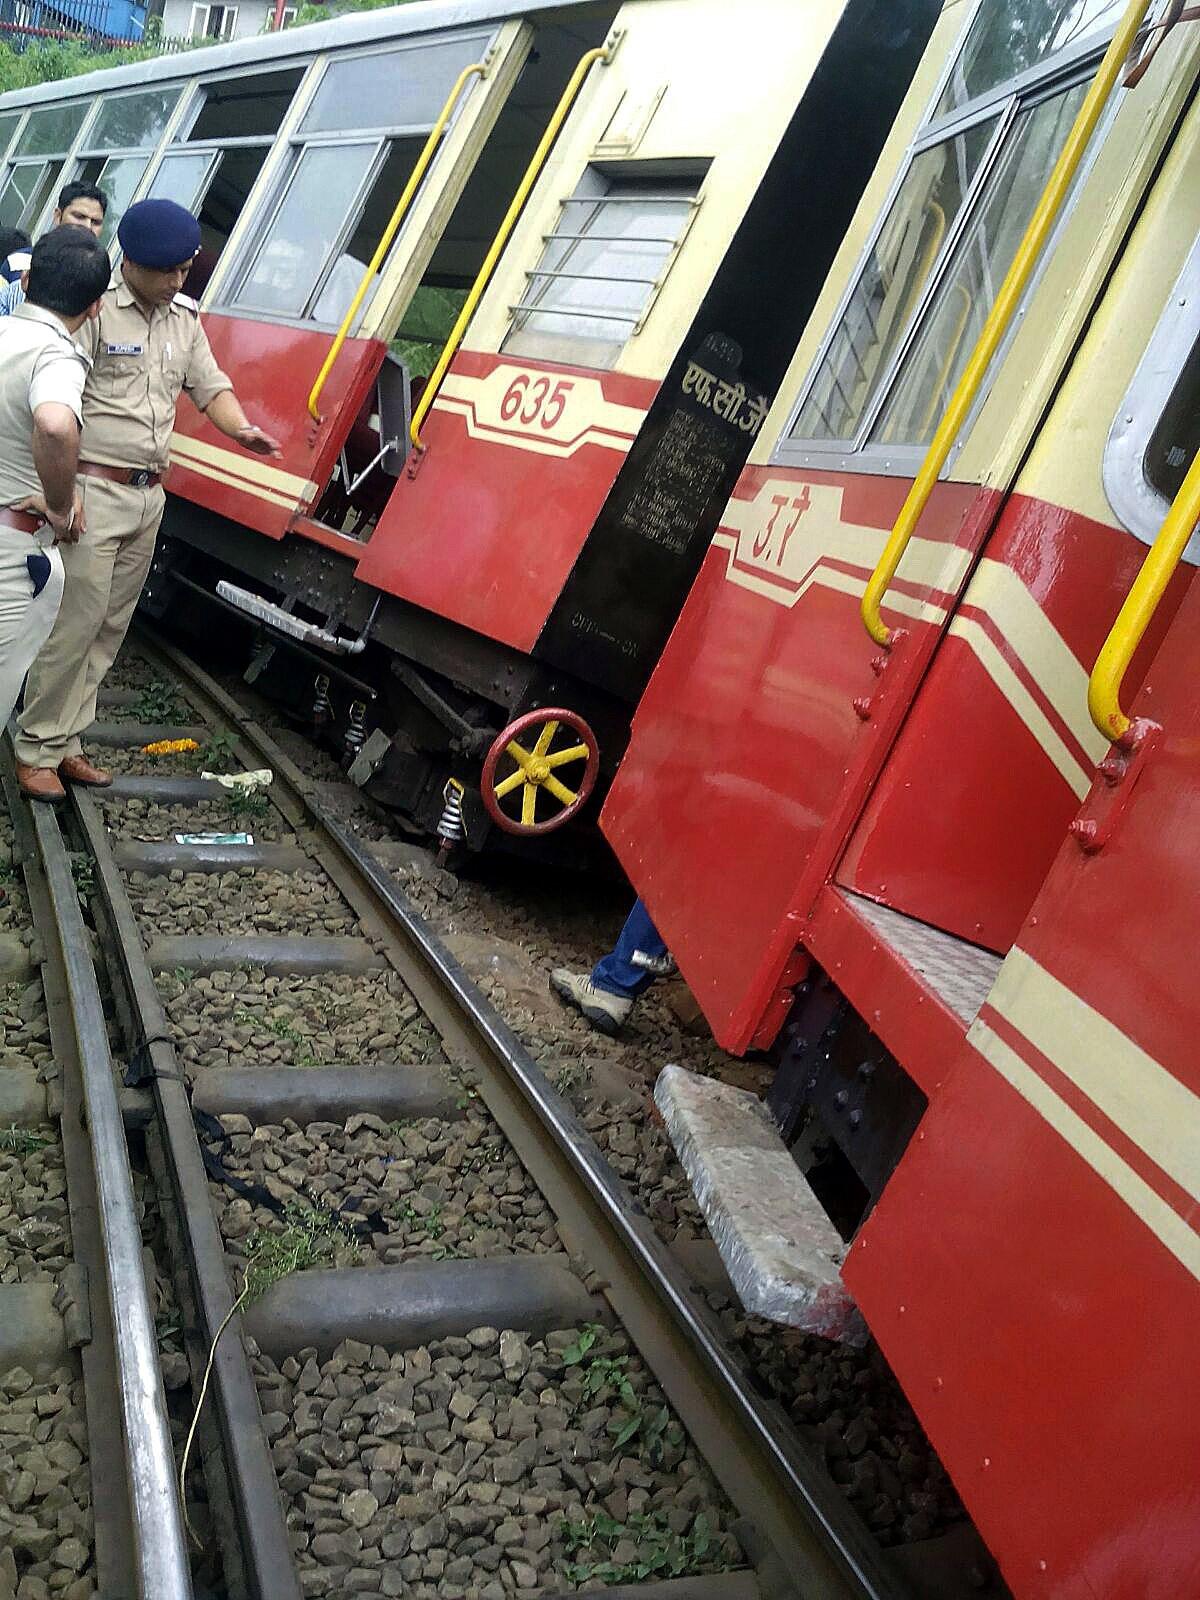 train derailment in India